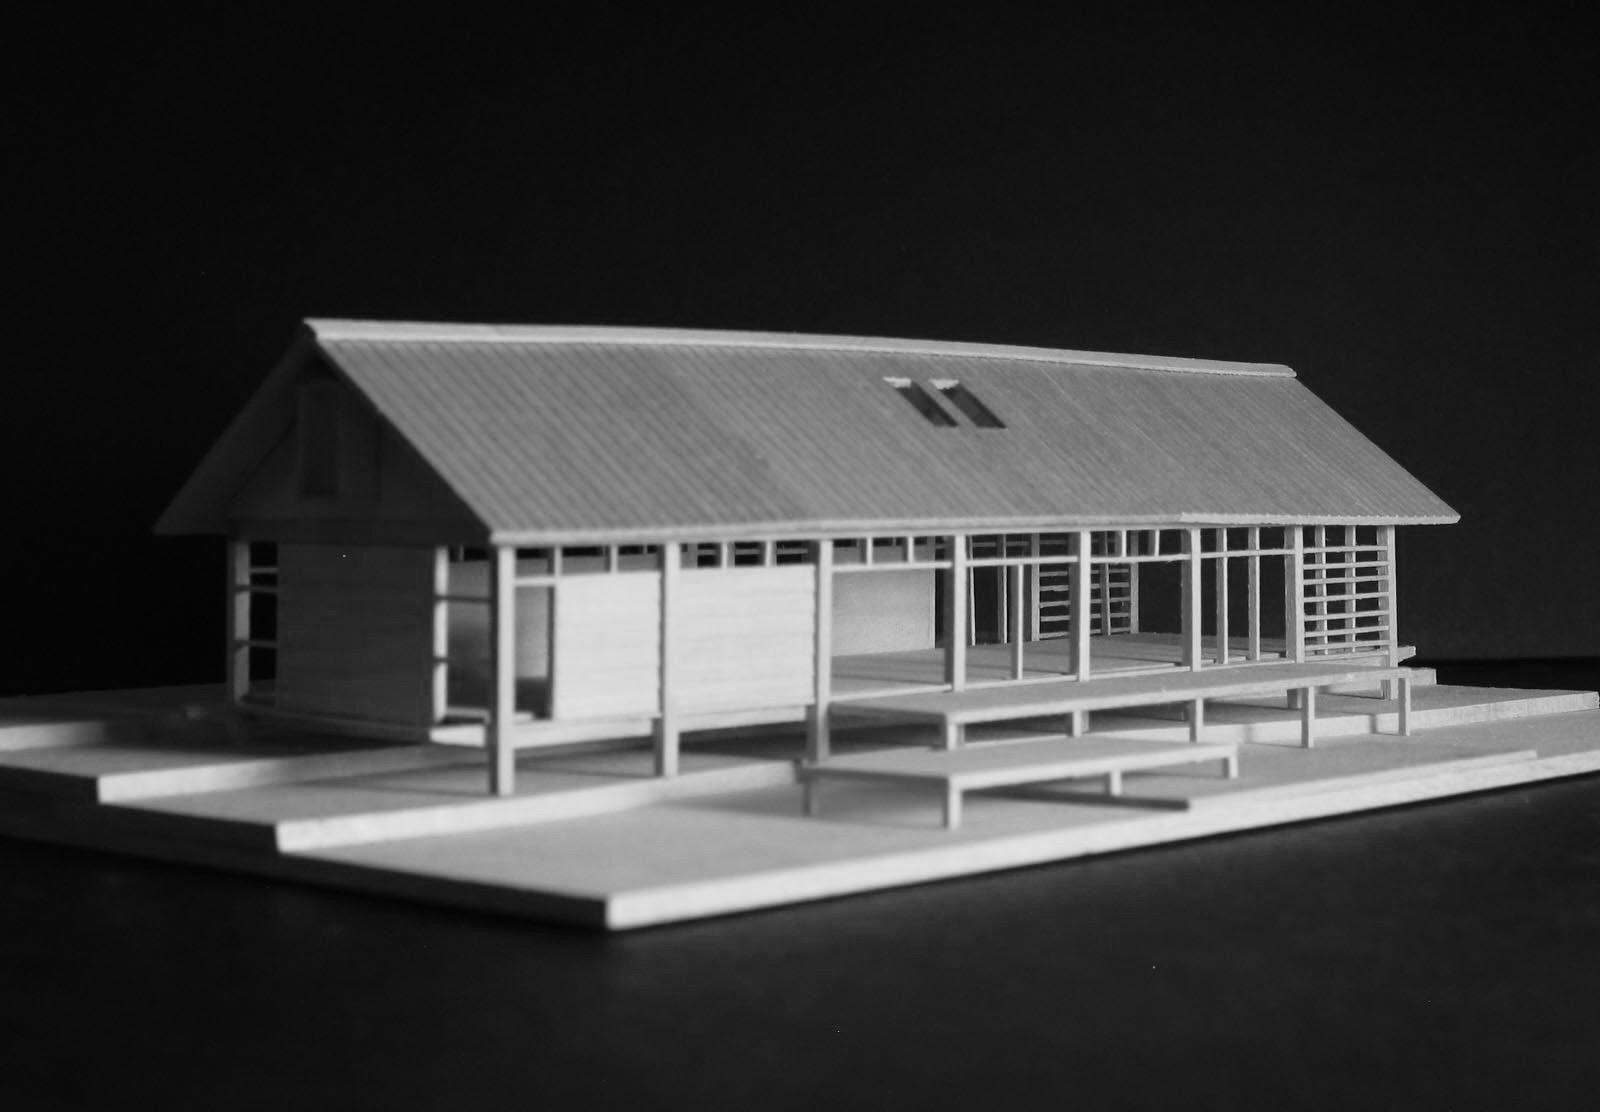 Presentation model of Navarro River House by Renée del Gaudio Architecture